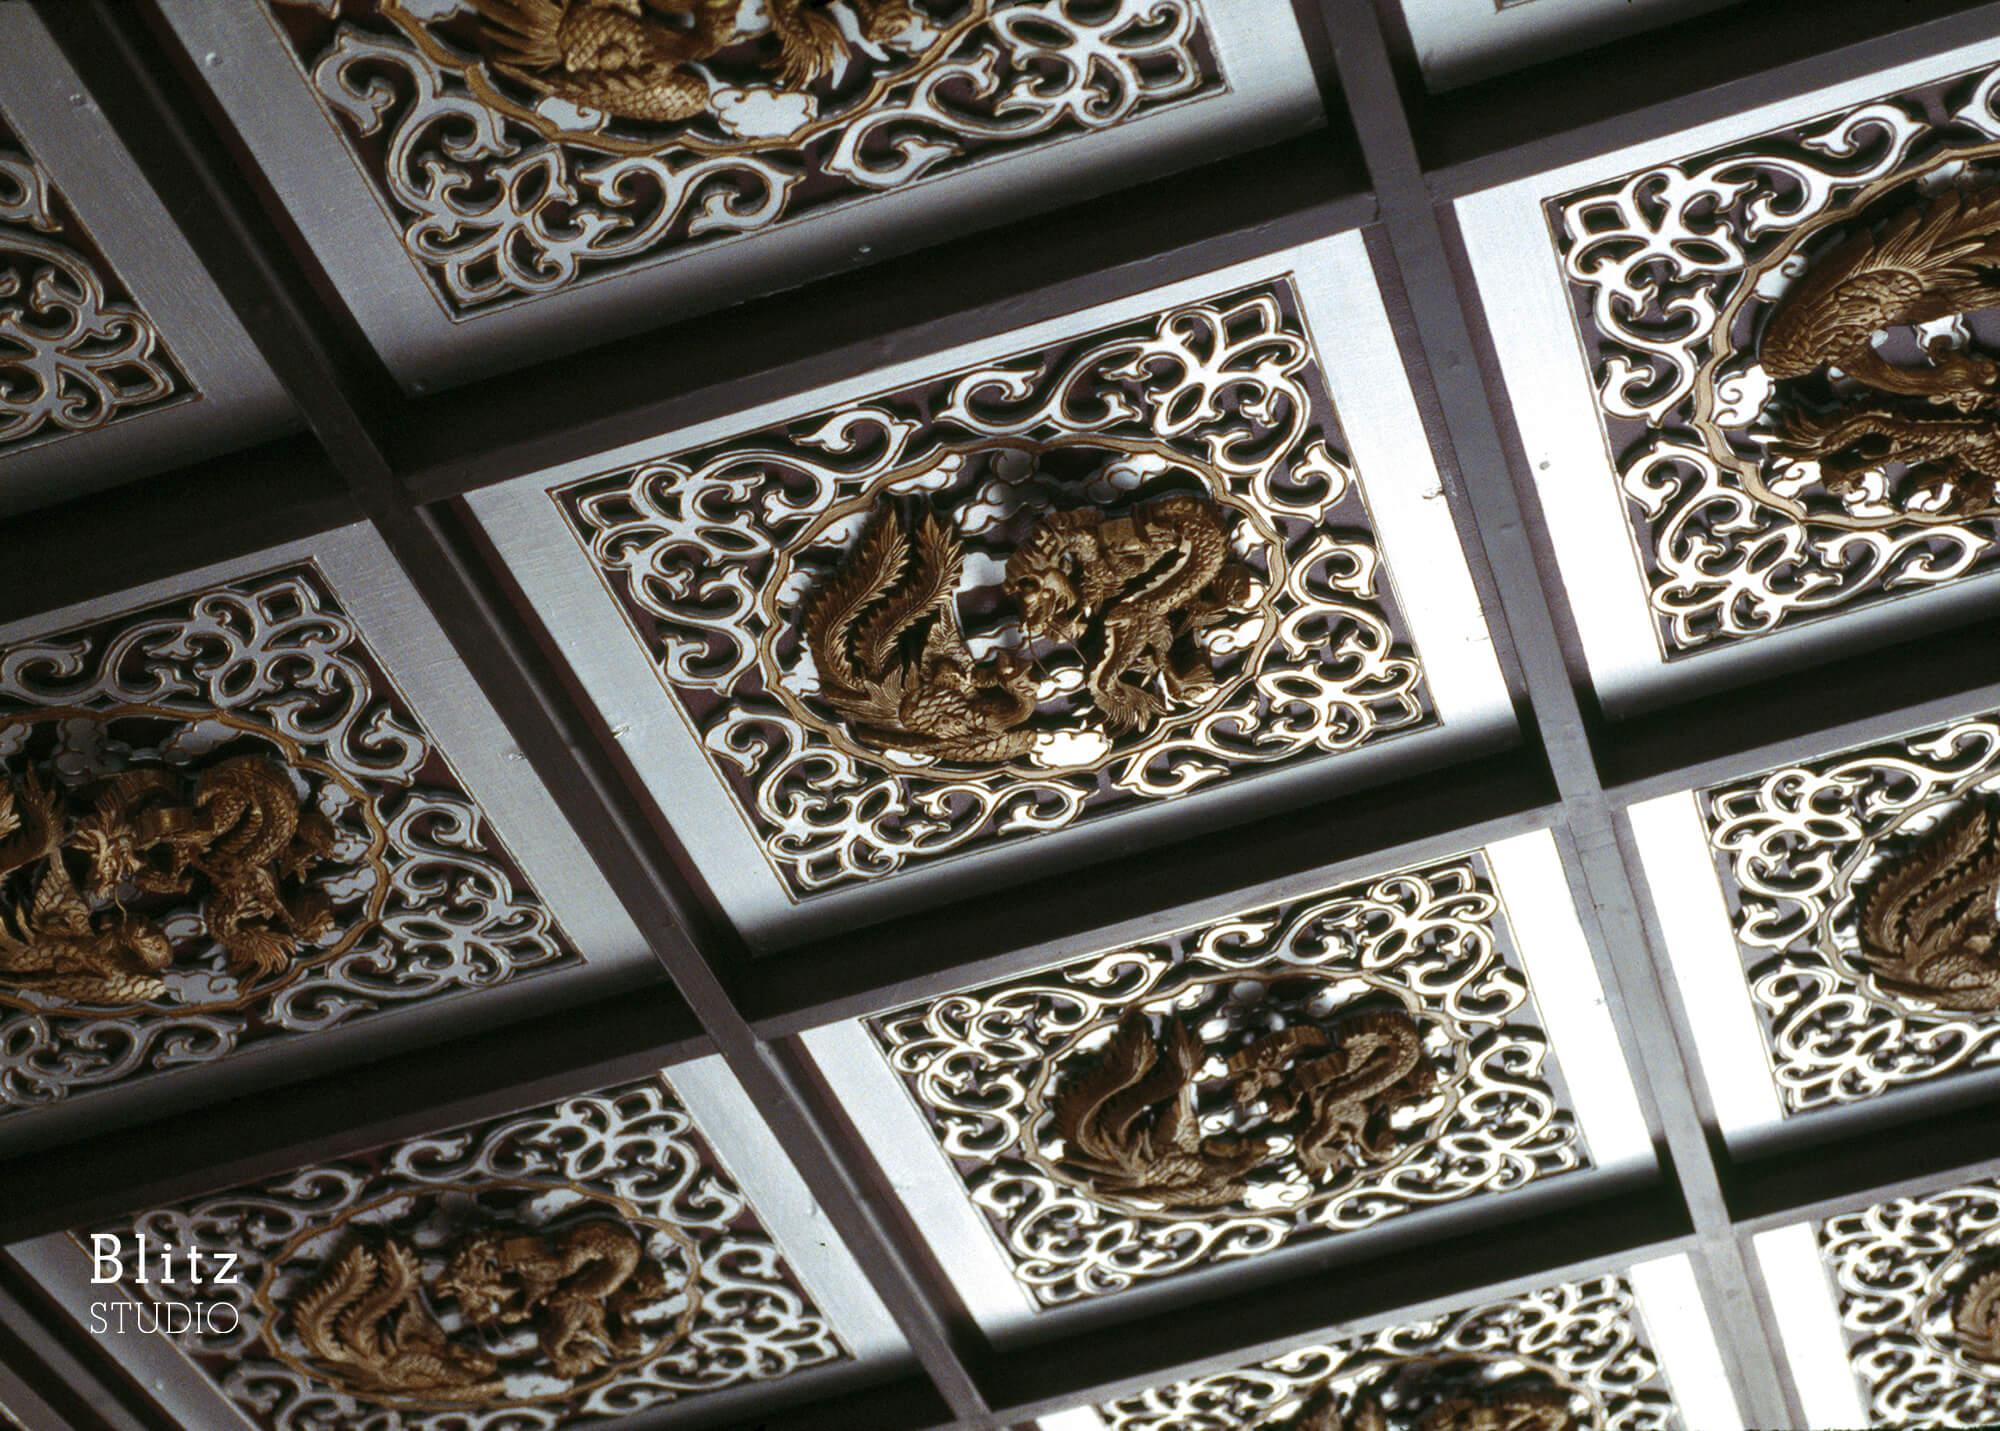 『中華料理 四海楼』建築写真・竣工写真・インテリア写真9